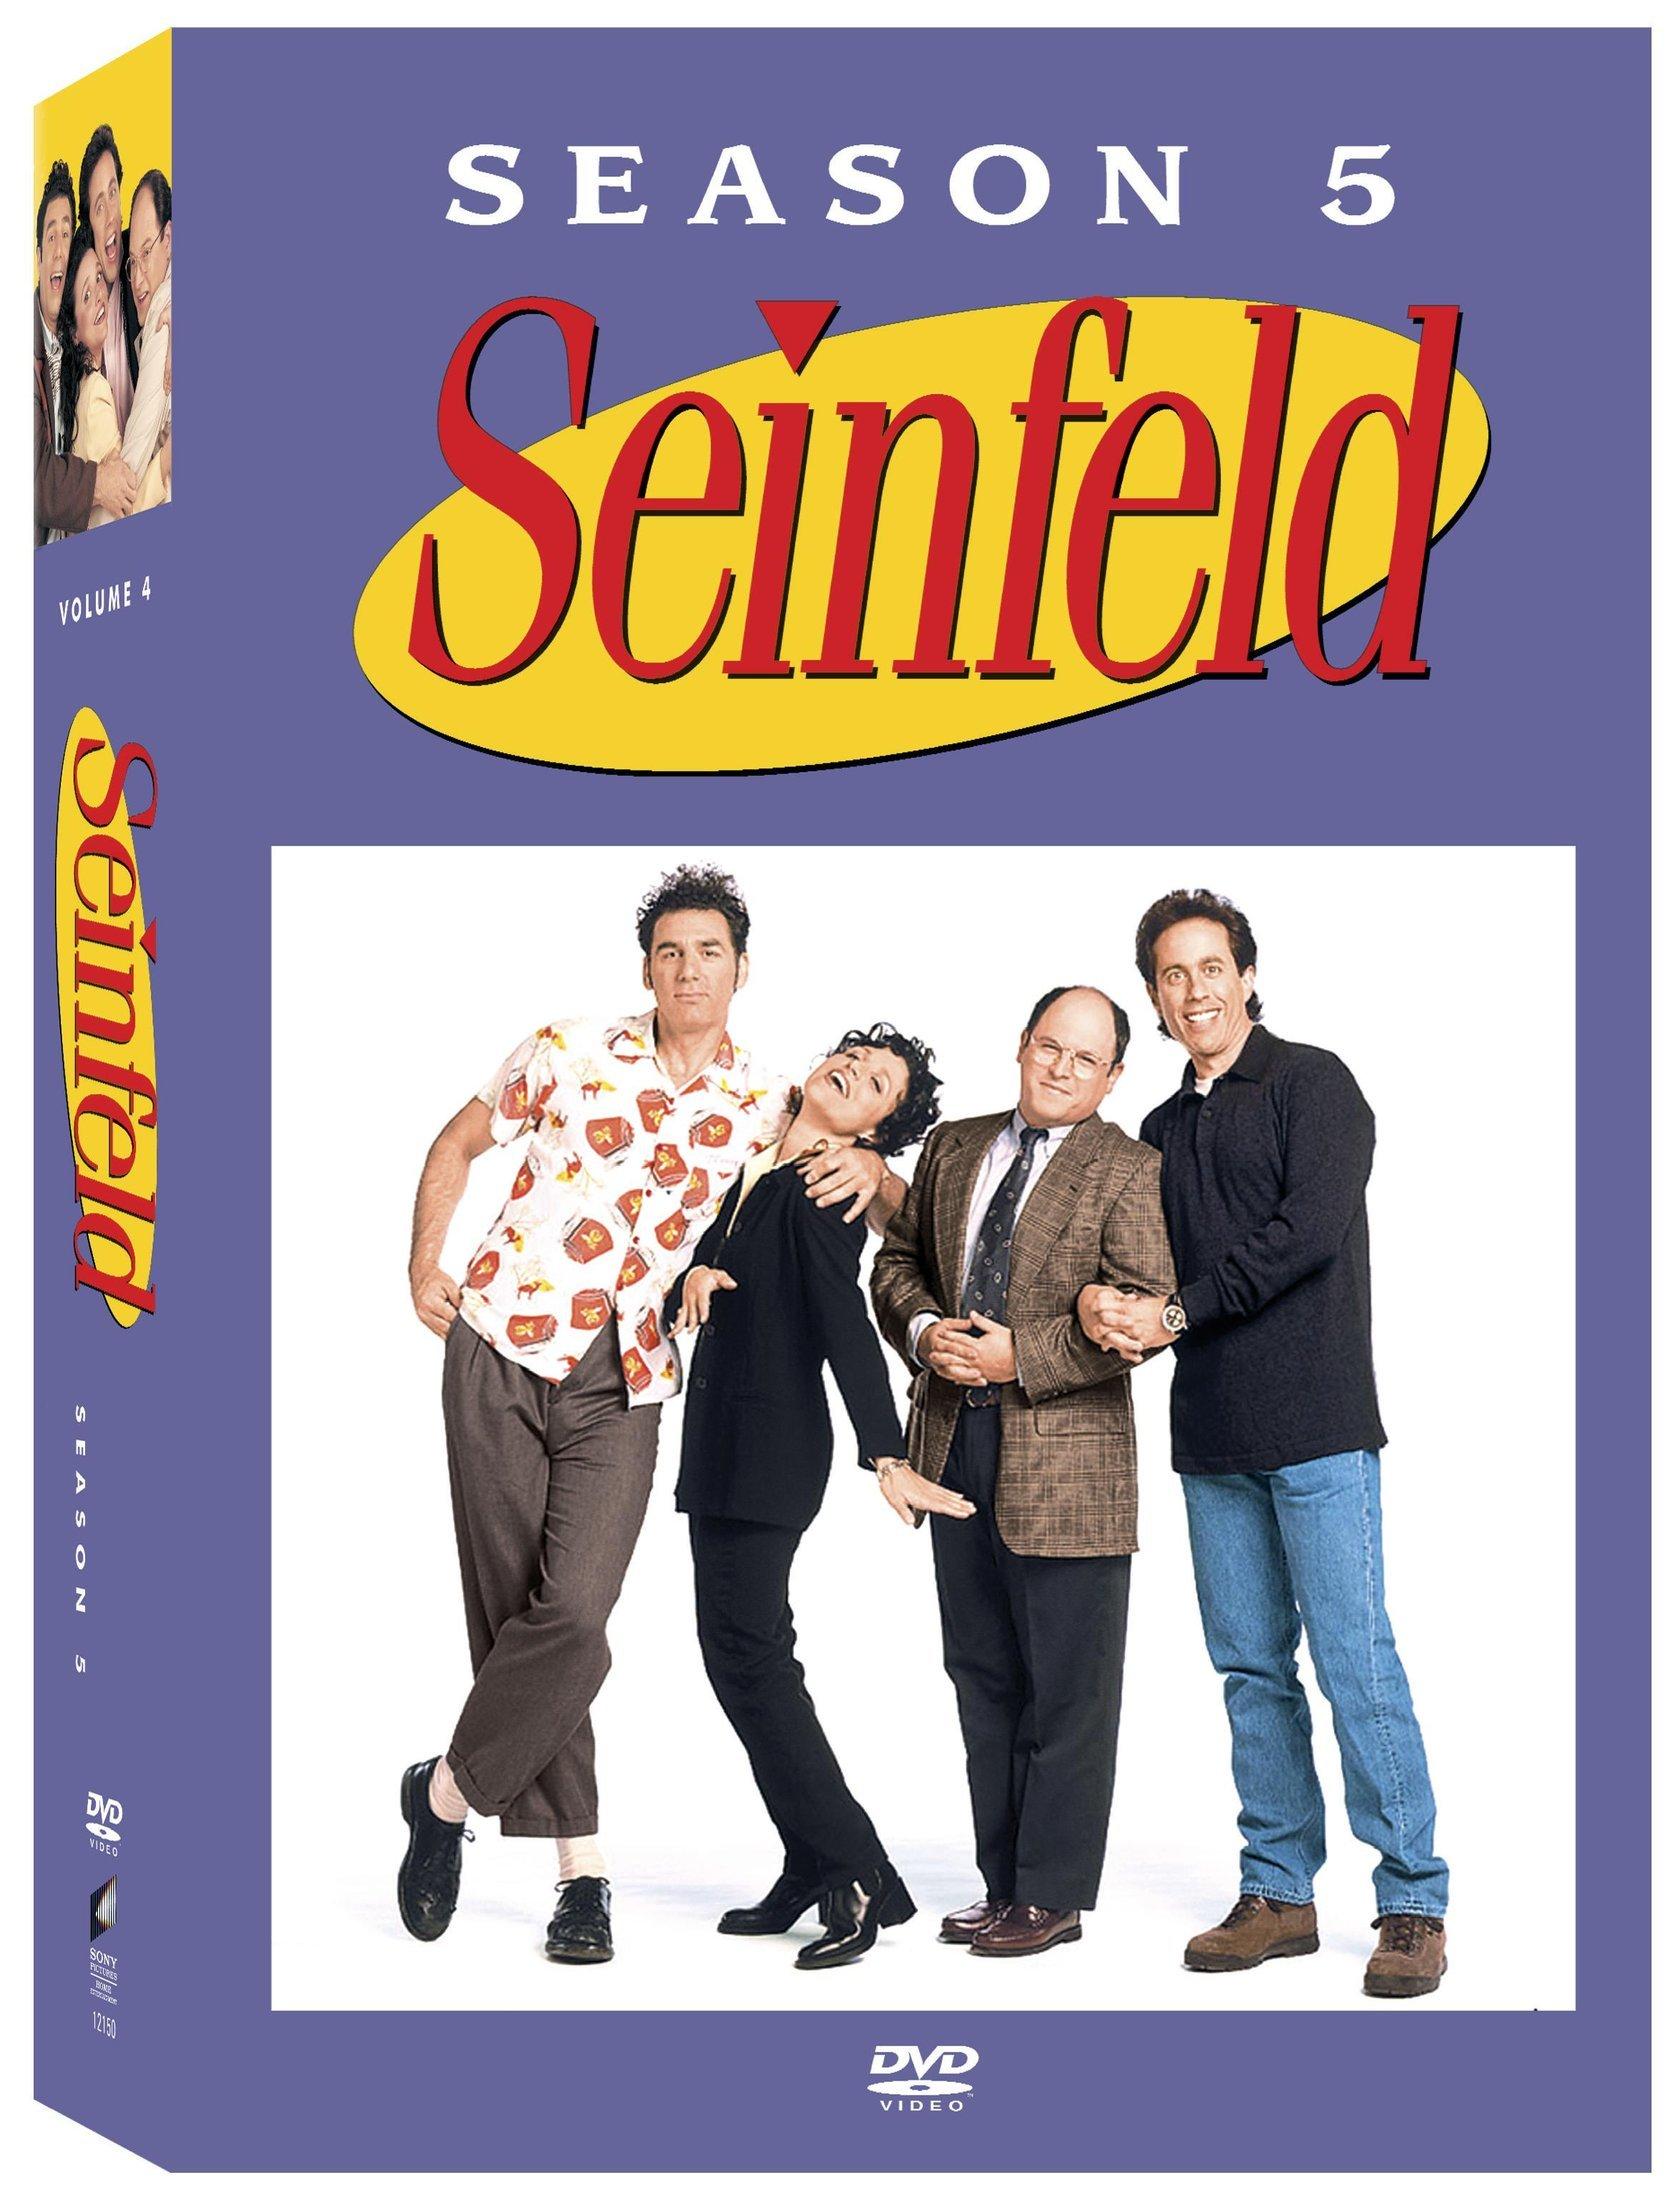 DVD : Seinfeld: The Complete Fifth Season (Boxed Set, Full Frame, , 4 Disc)